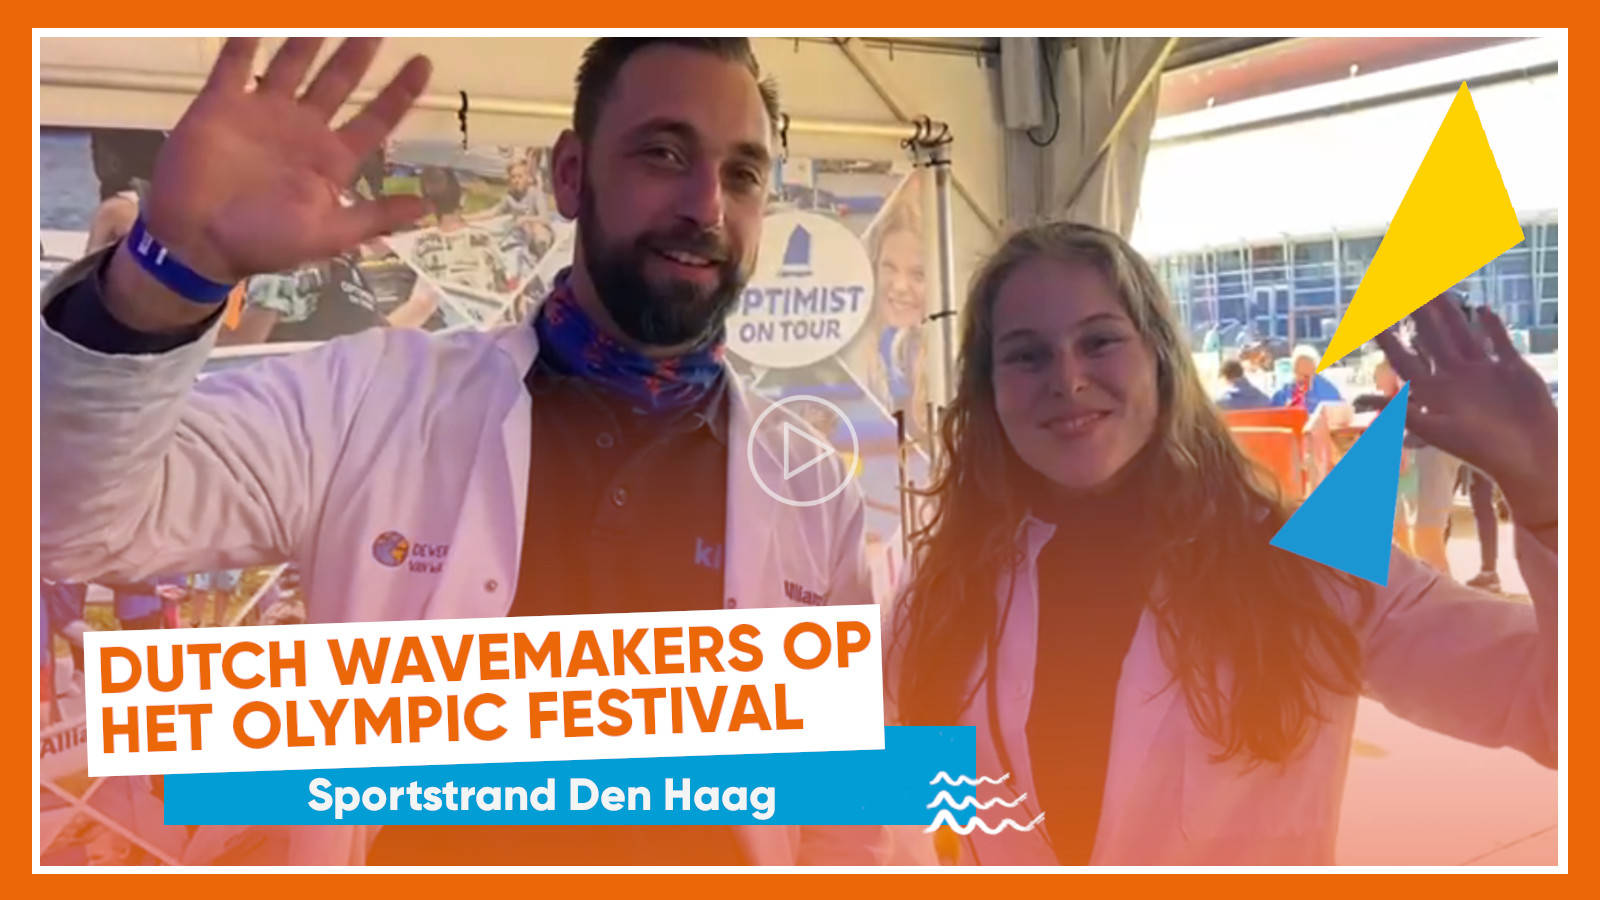 olympicfestival_thumbnail50